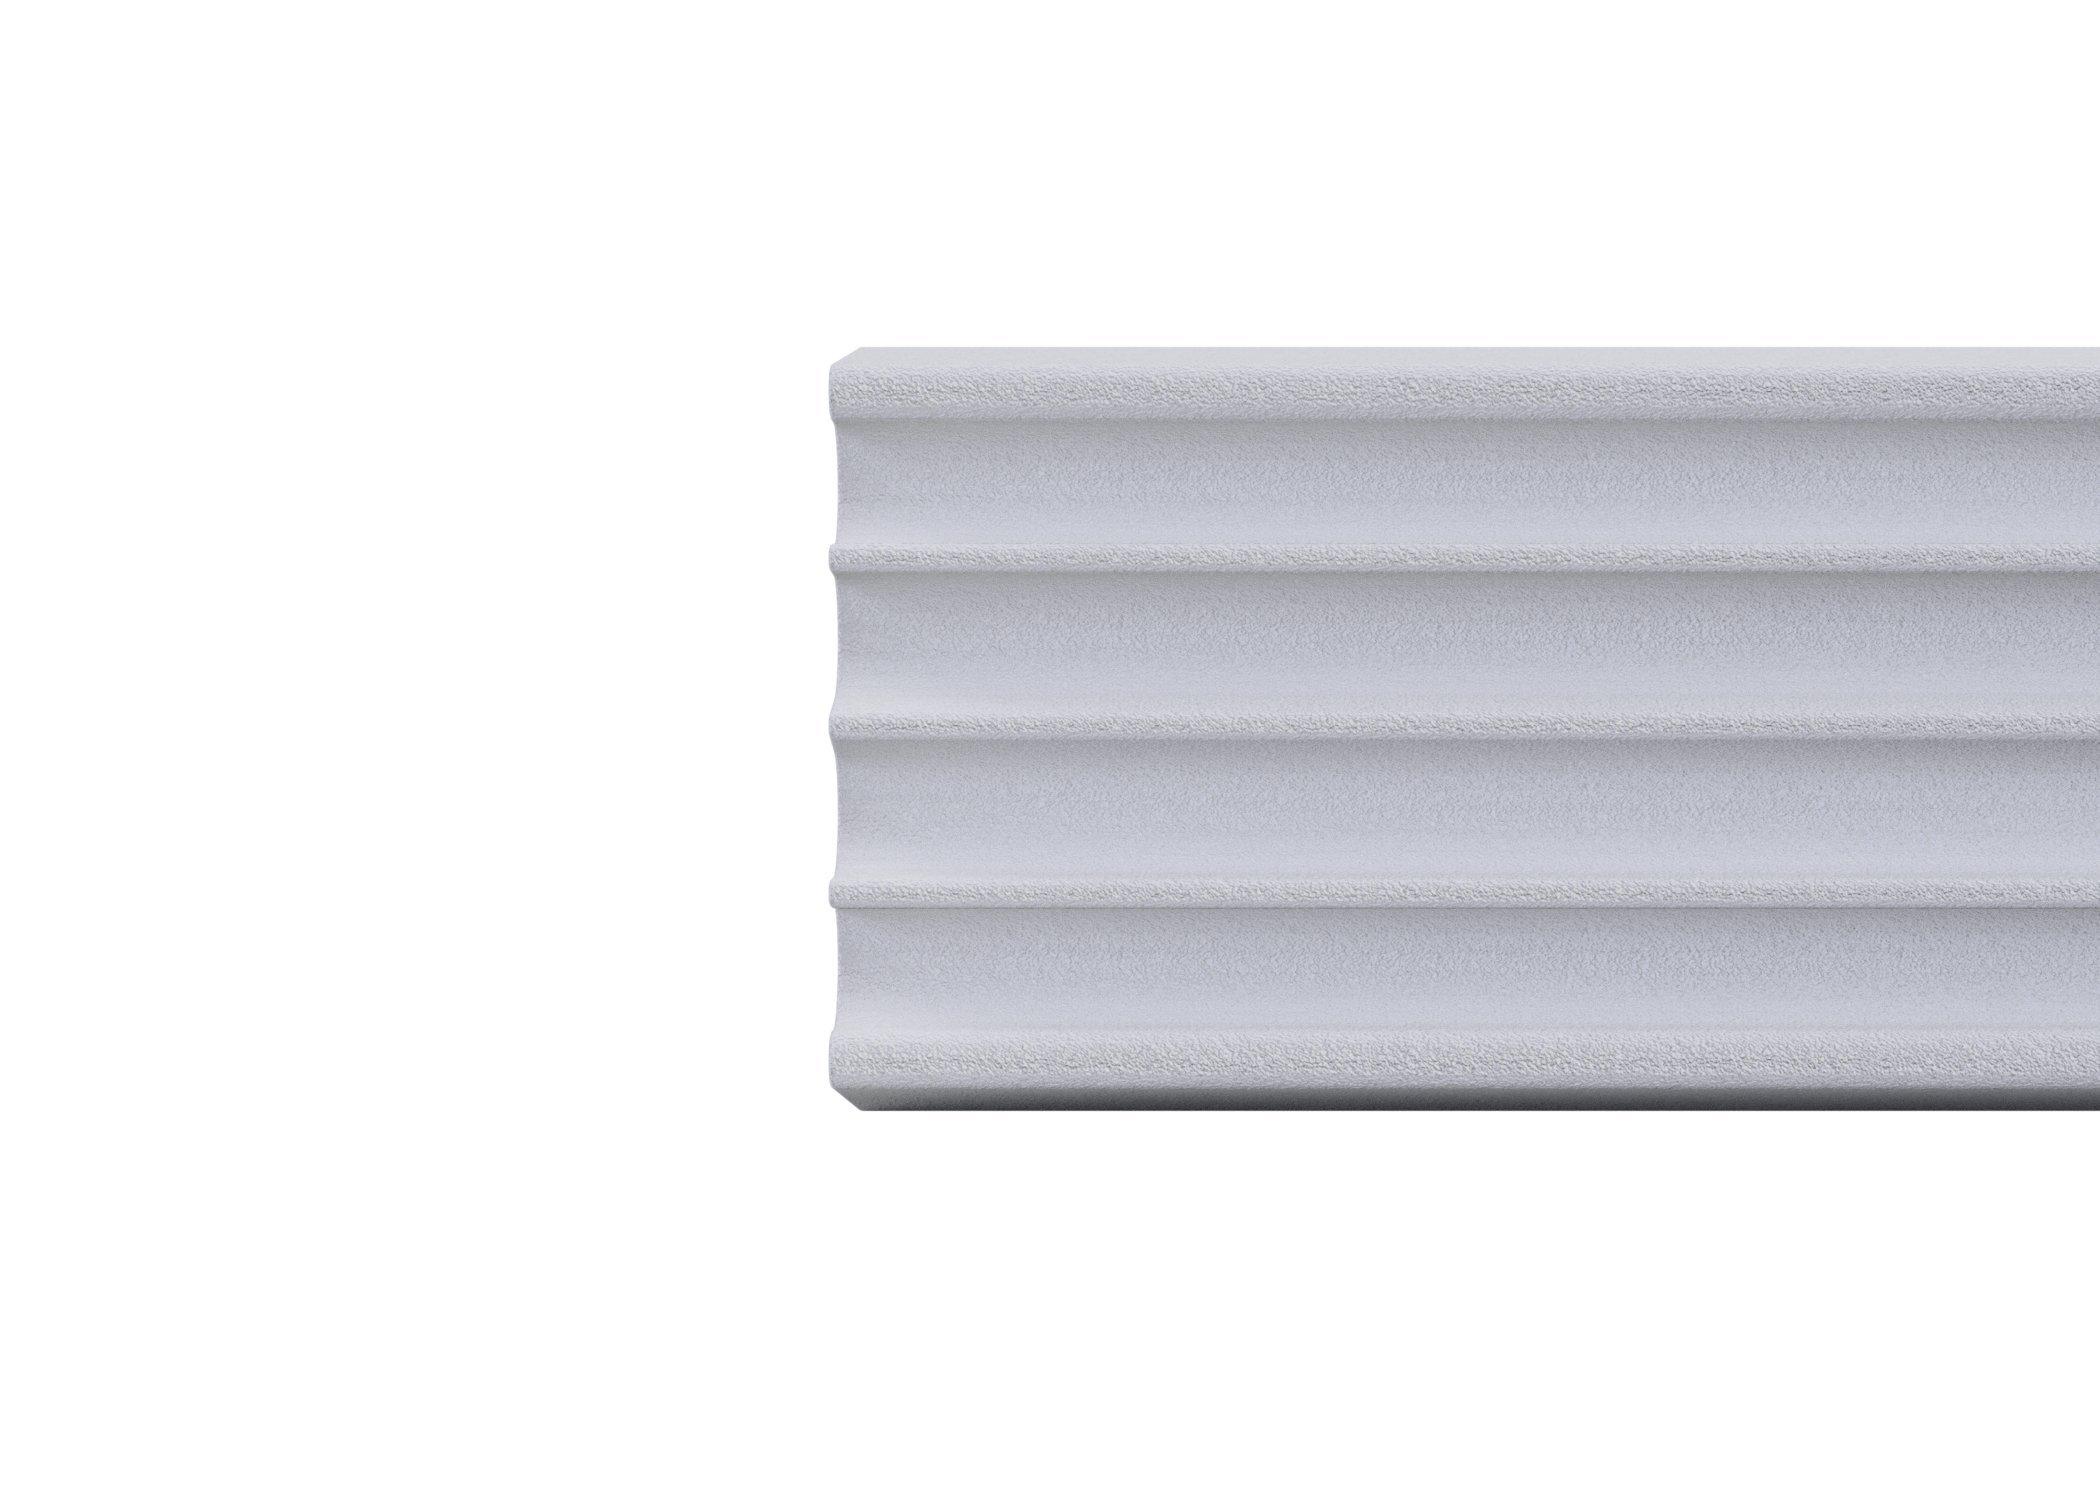 STORMGUARD 05SR693050MW Self-Adhesive Dryglaze Tape, White, 15 x 8 mm x 50 m